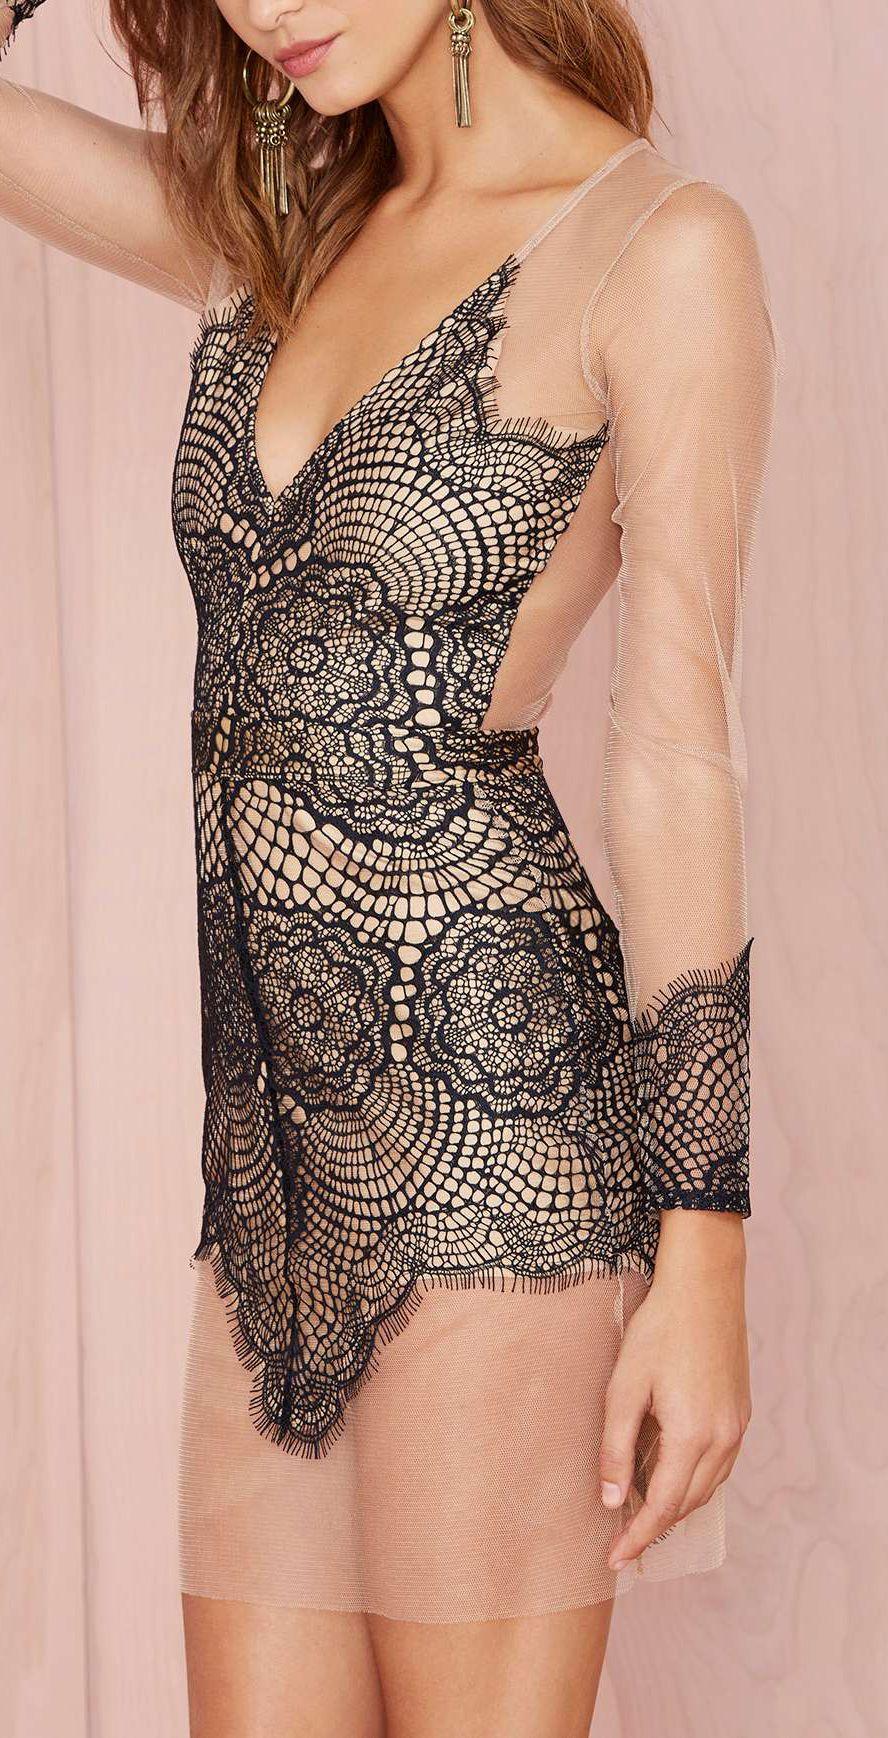 Pin by dharani vijay on dress pinterest lingerie sheer dress